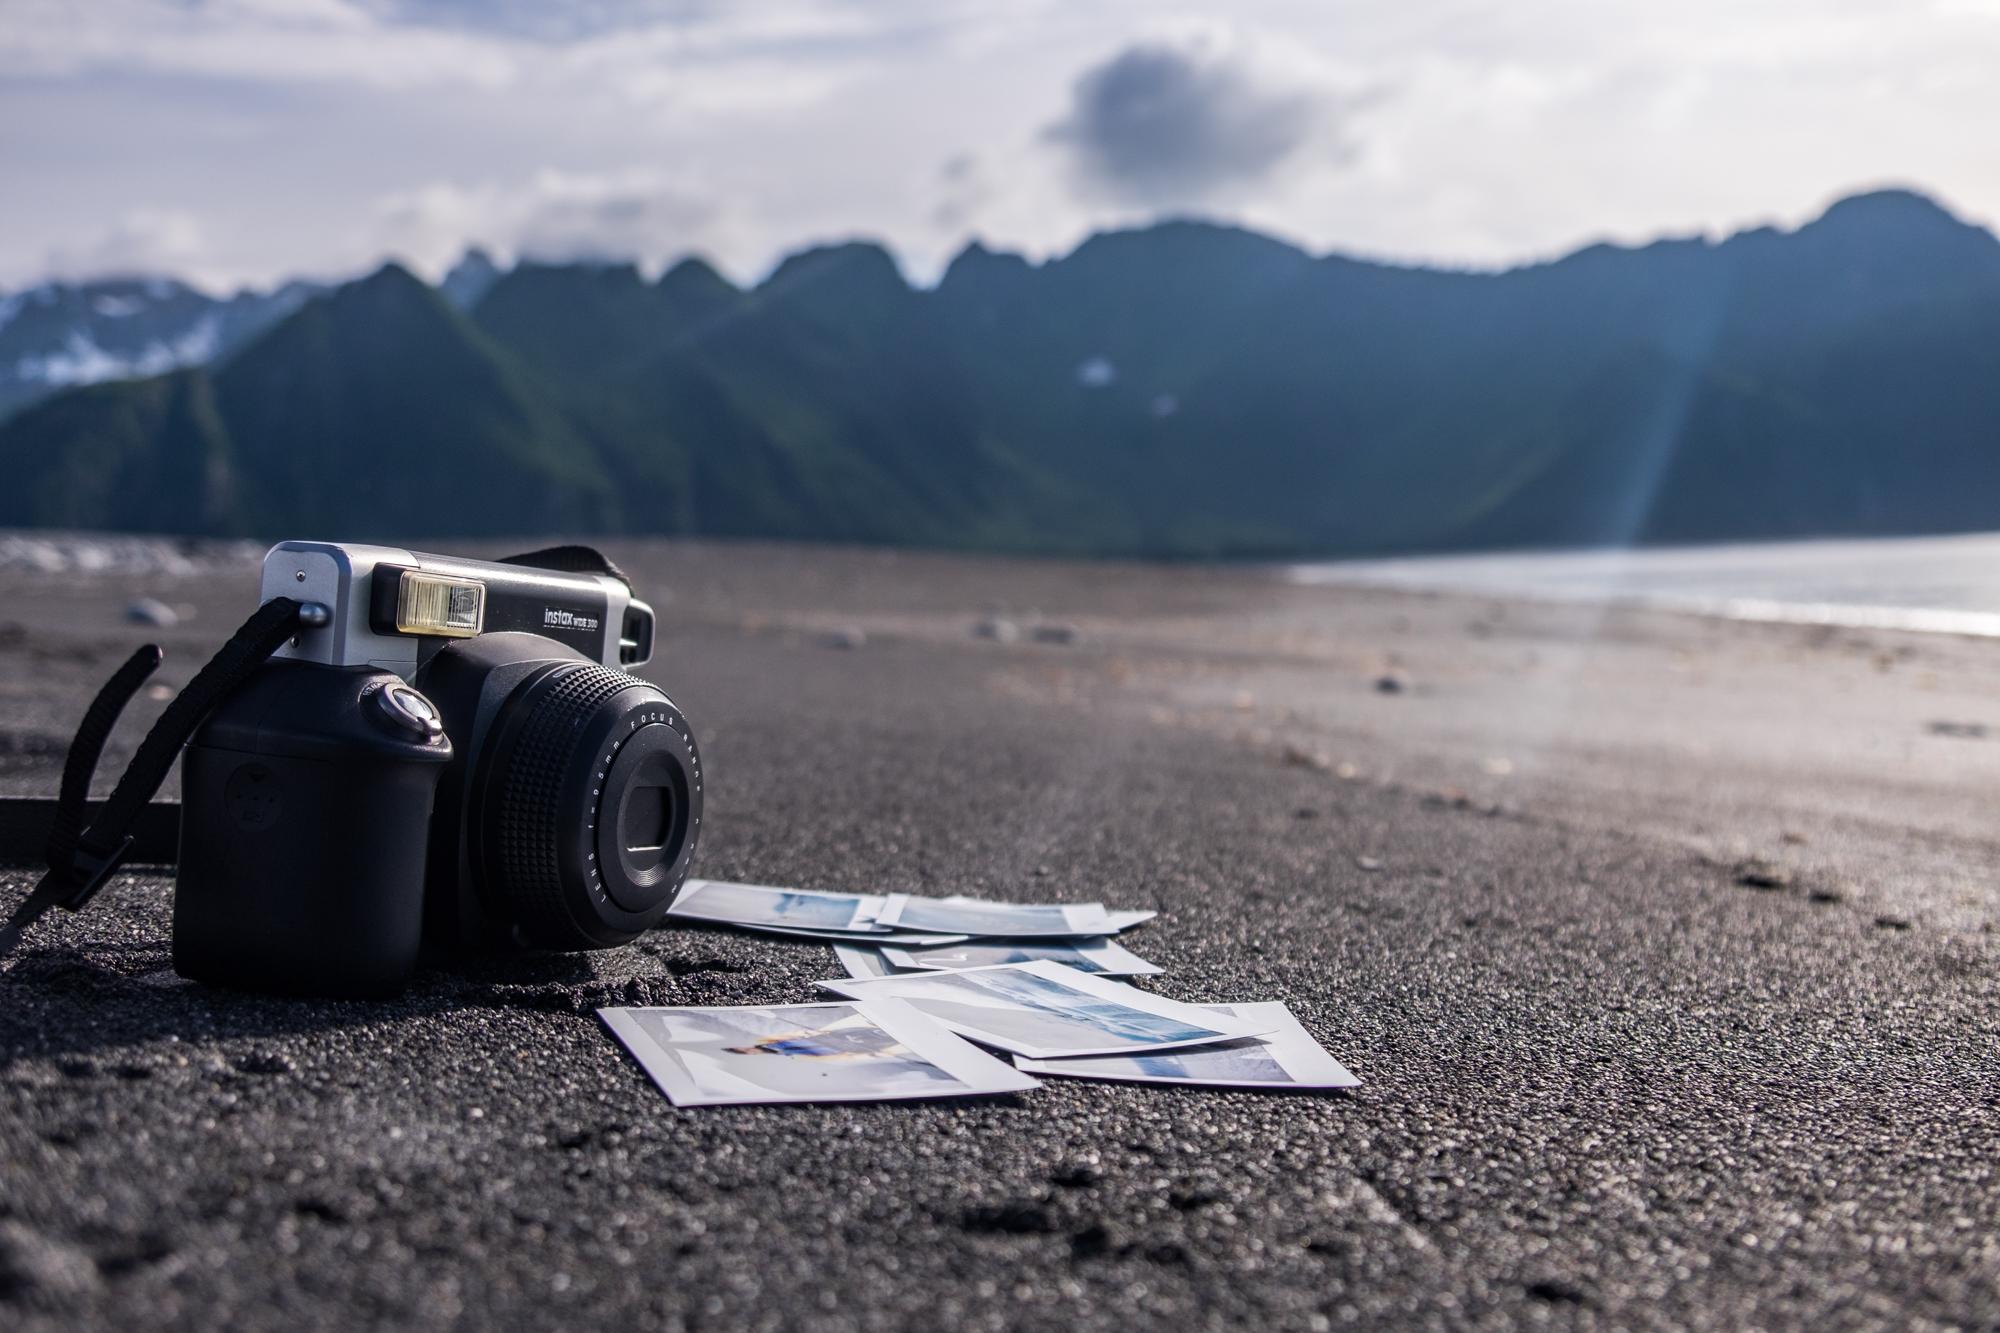 Instaxing on a black sand beach at Kenai Fjords National Park in Alaska.